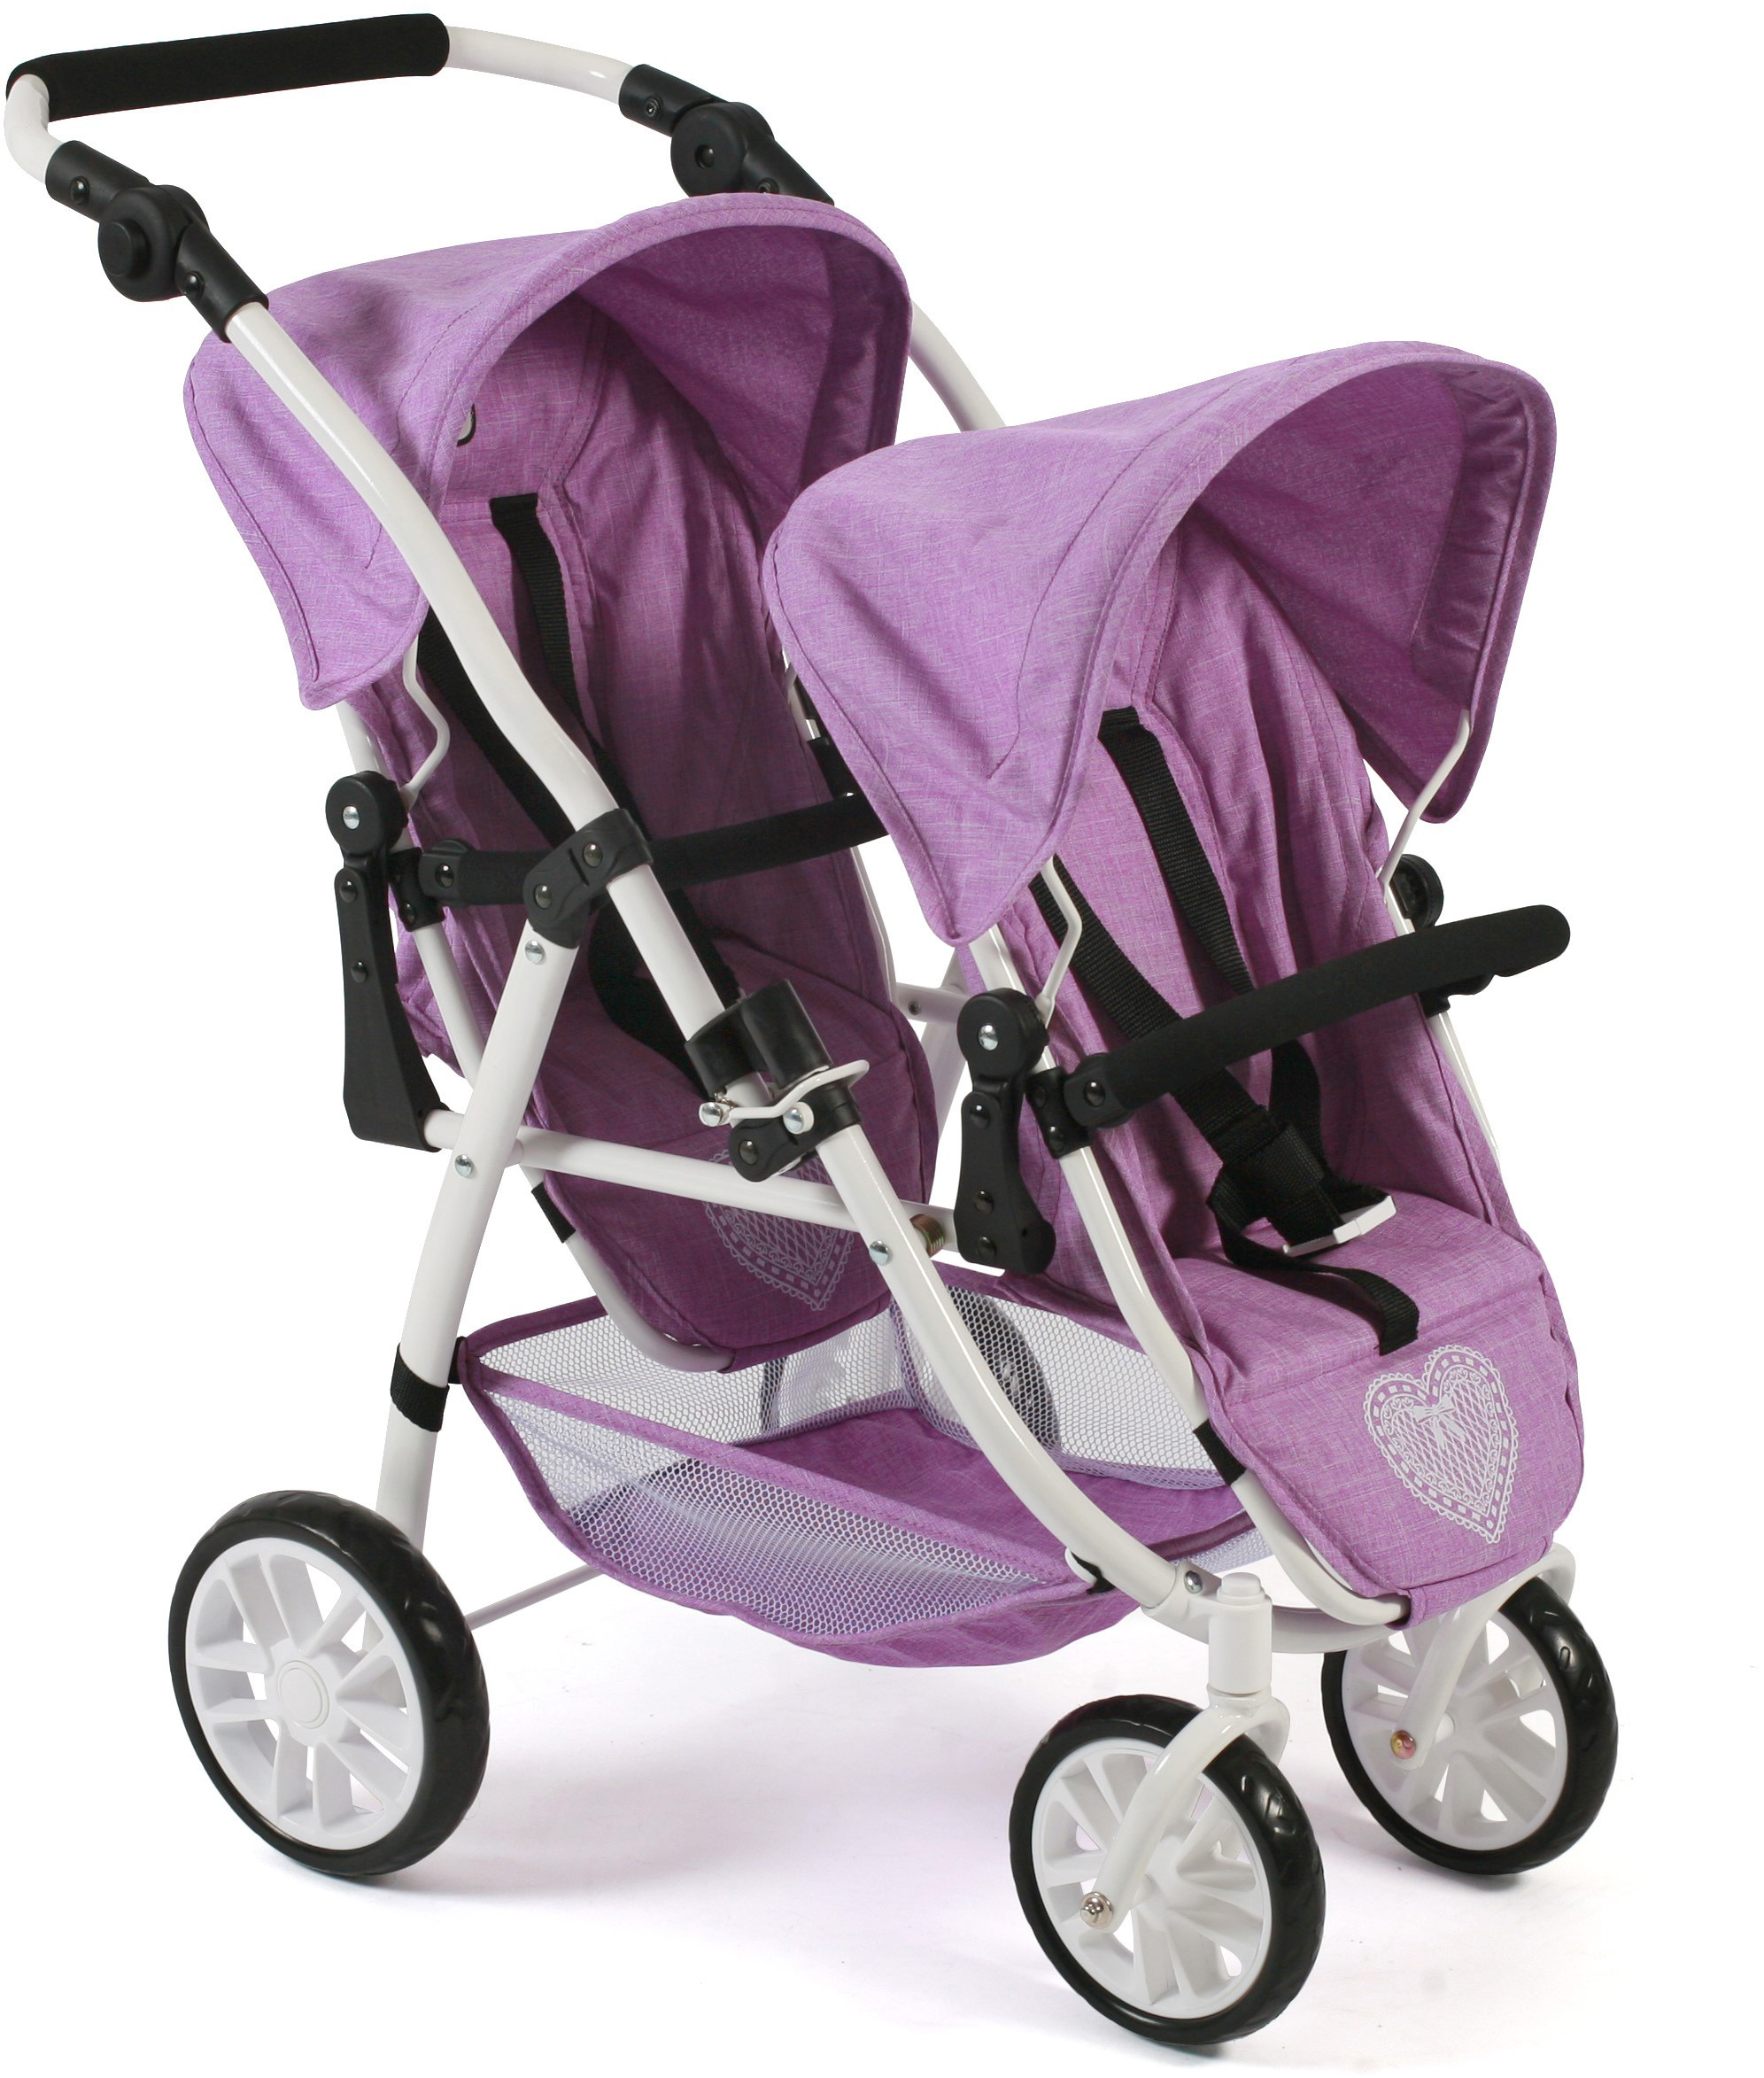 CHIC2000 Puppen-Zwillingsbuggy Tandem-Puppen-Buggy Vario, flieder lila Kinder Puppenzubehör Puppen Puppenwagen